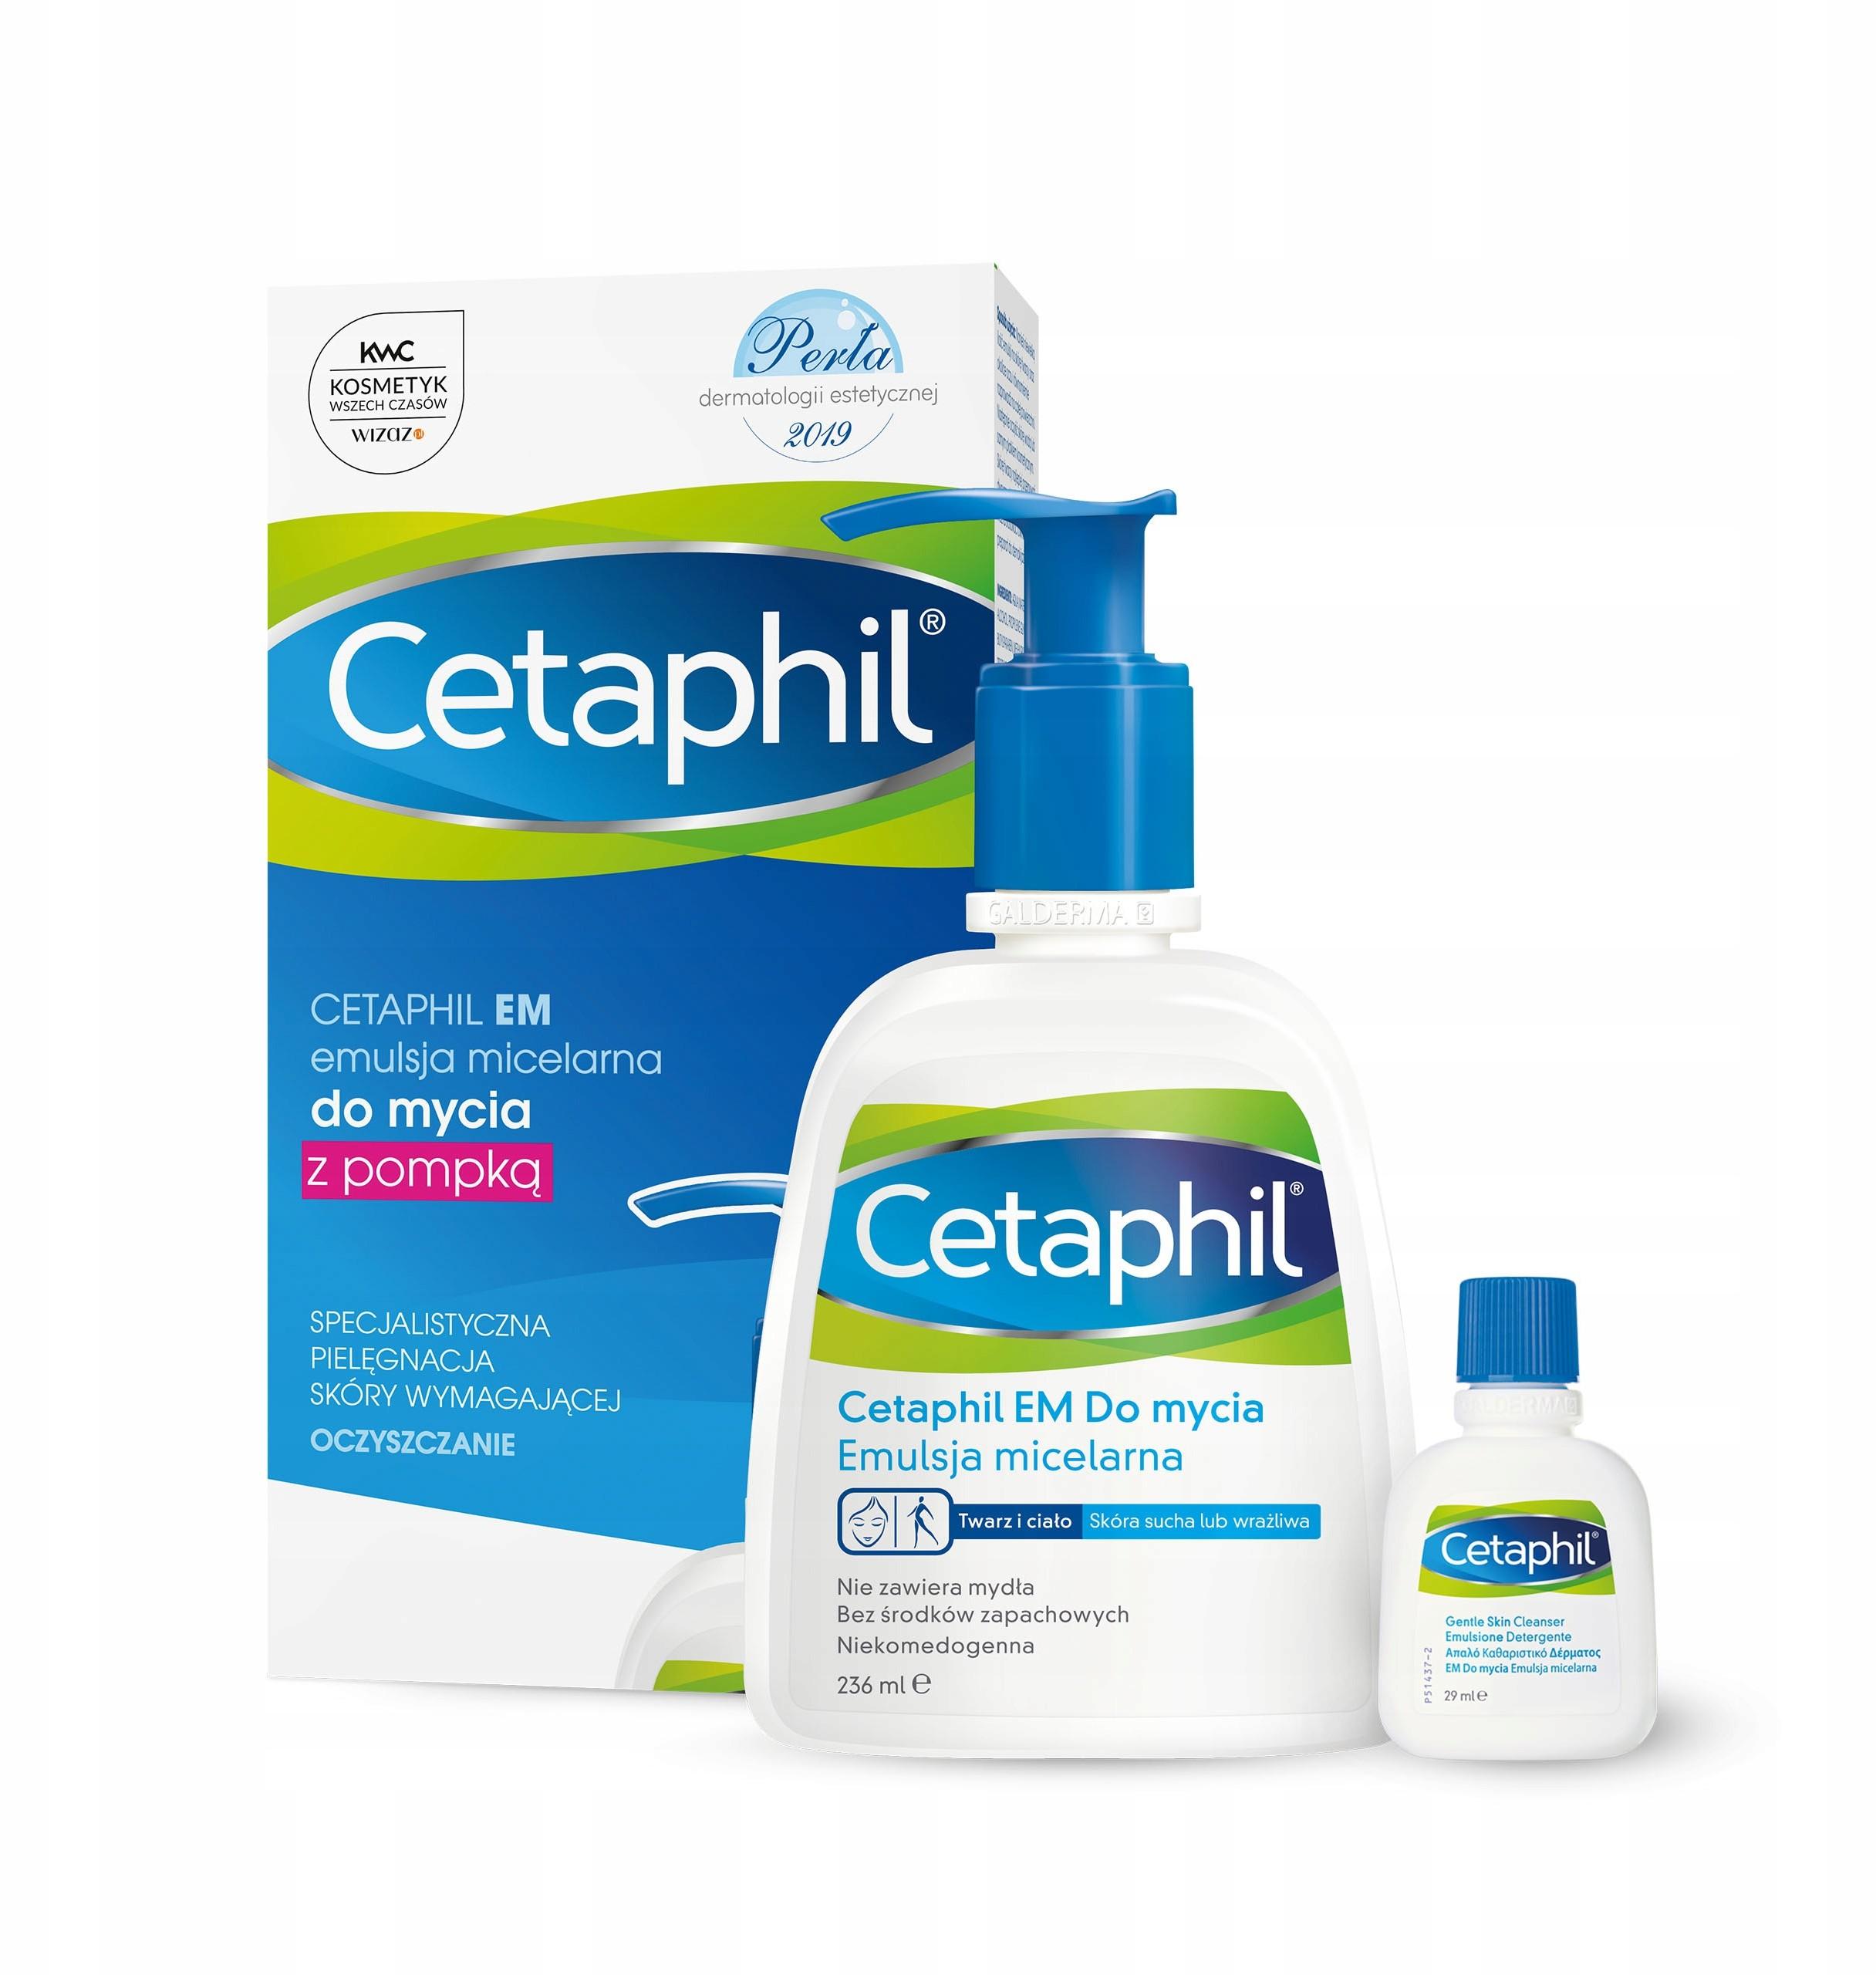 Cetaphil Em Emulsja 236 ml i mini produkt Em 29 ml